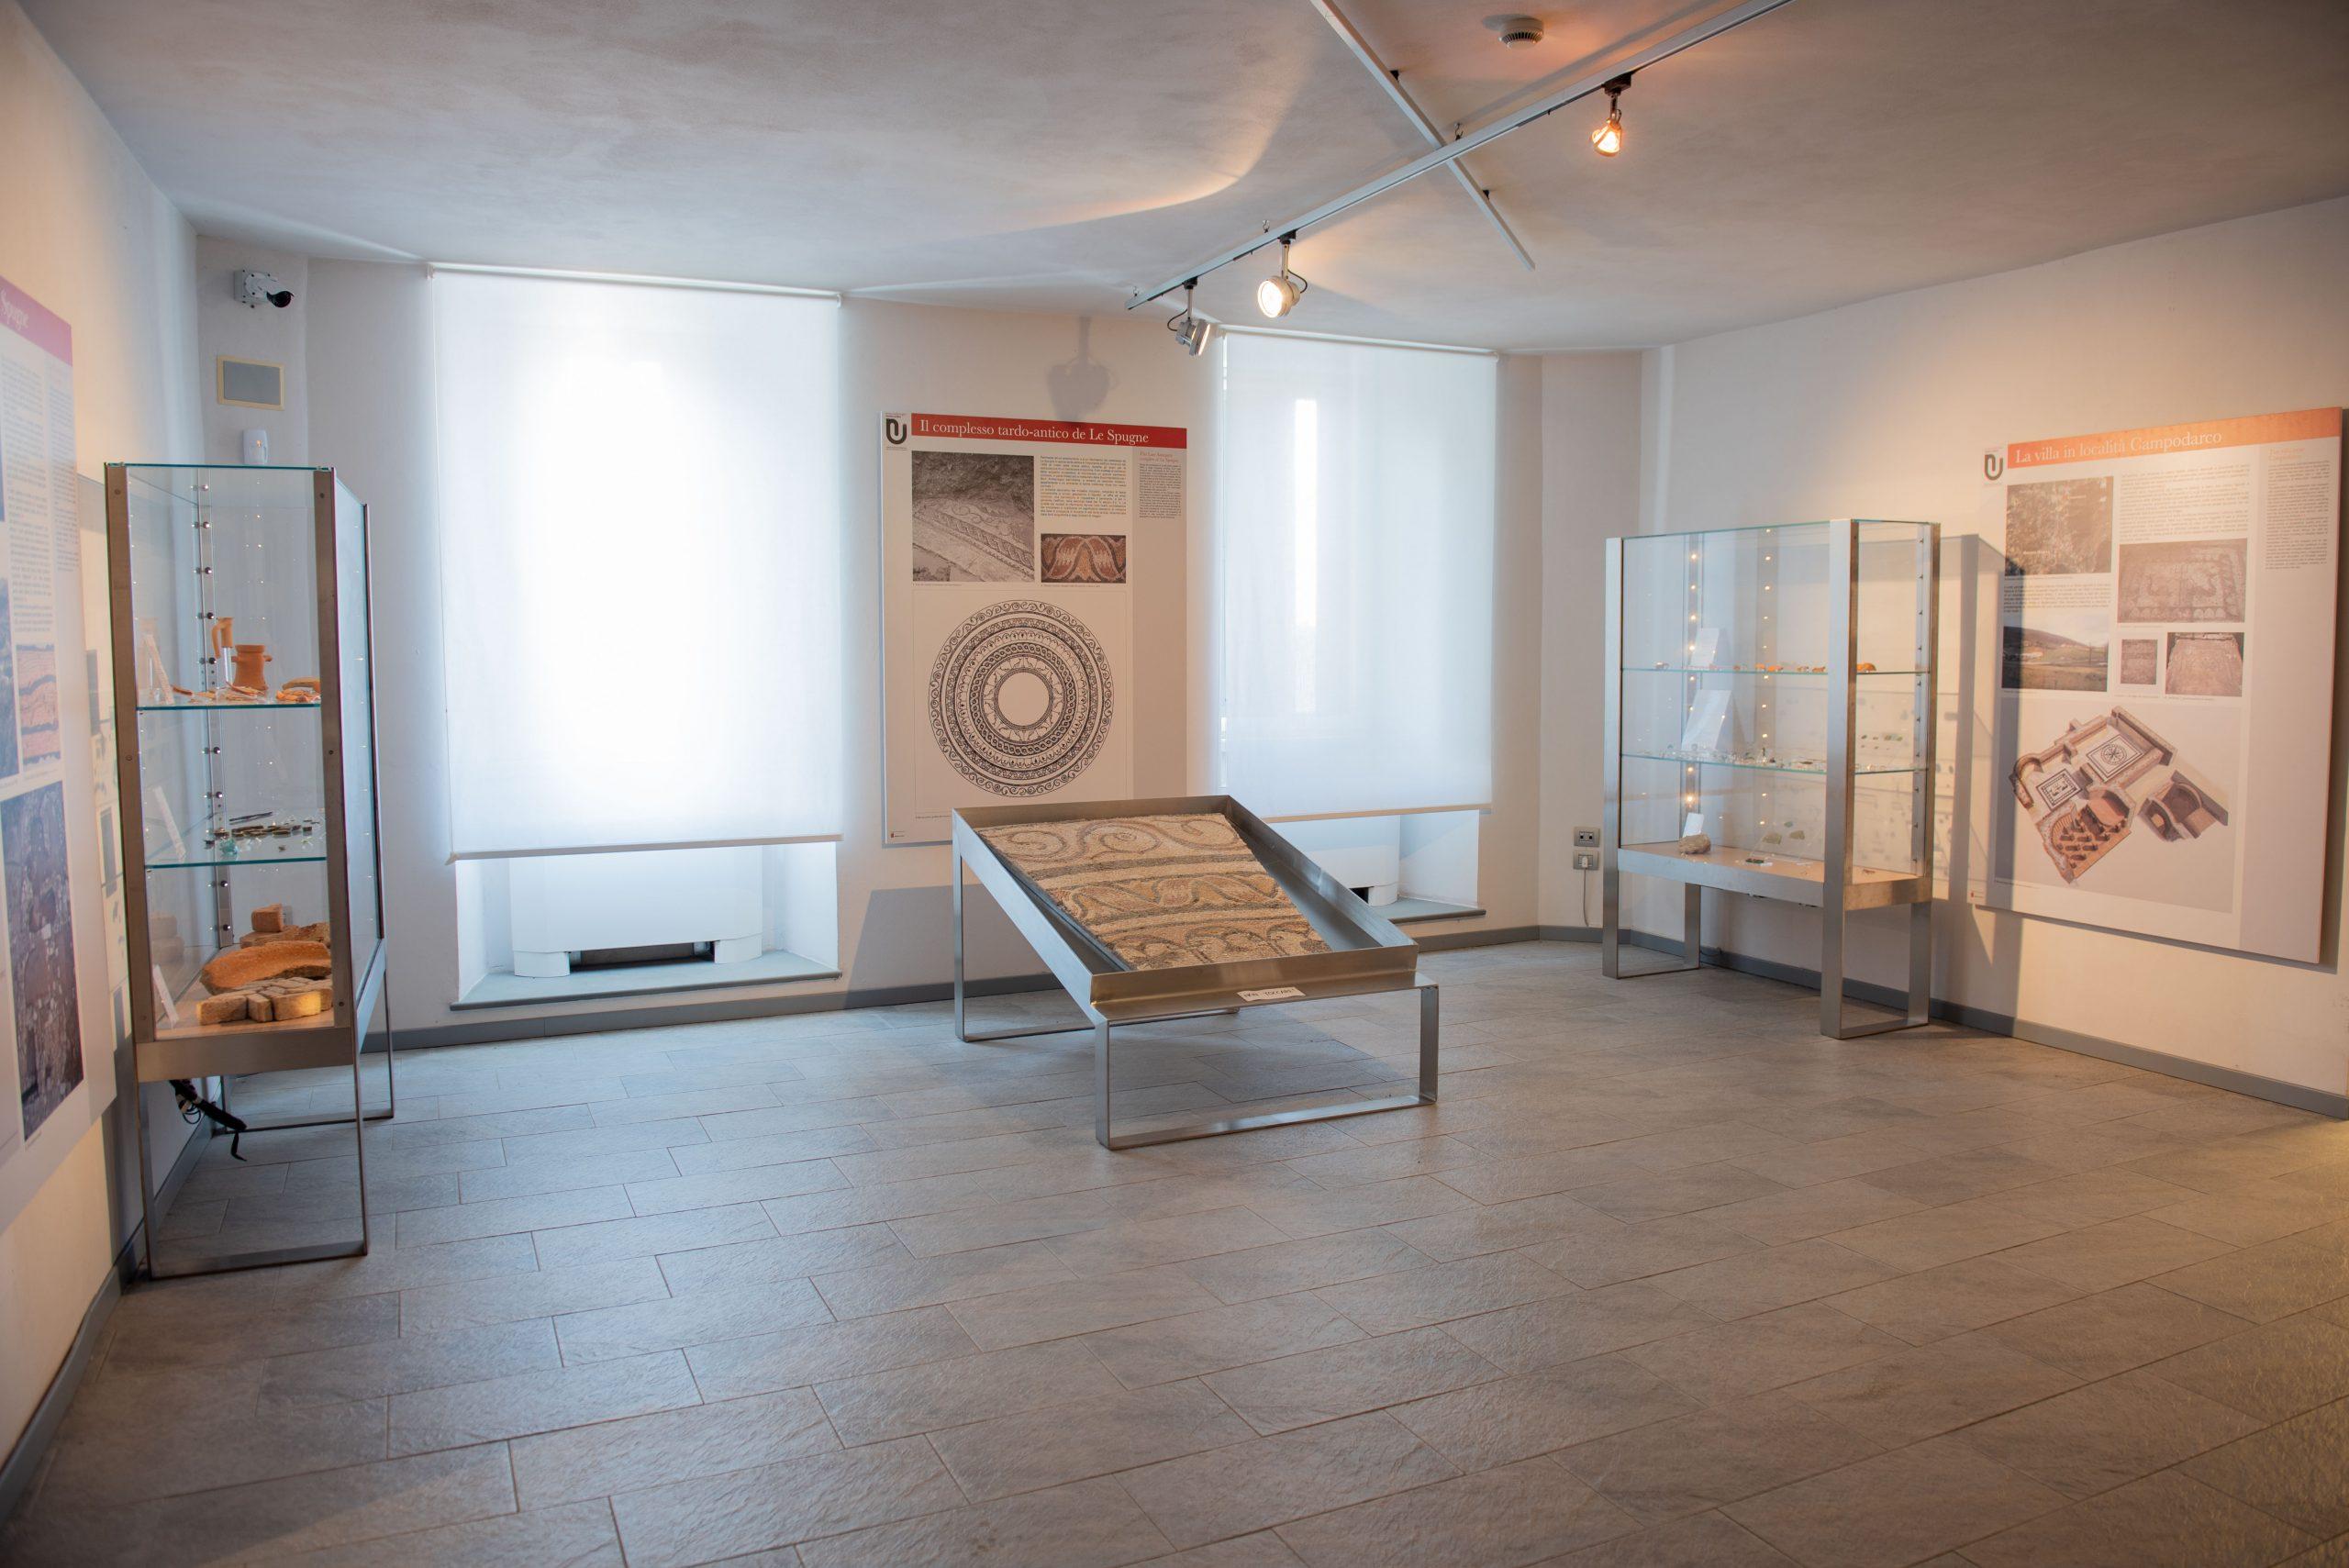 MUSEO ARCHEOLOGICO - NOCERA UMBRA - MeTU